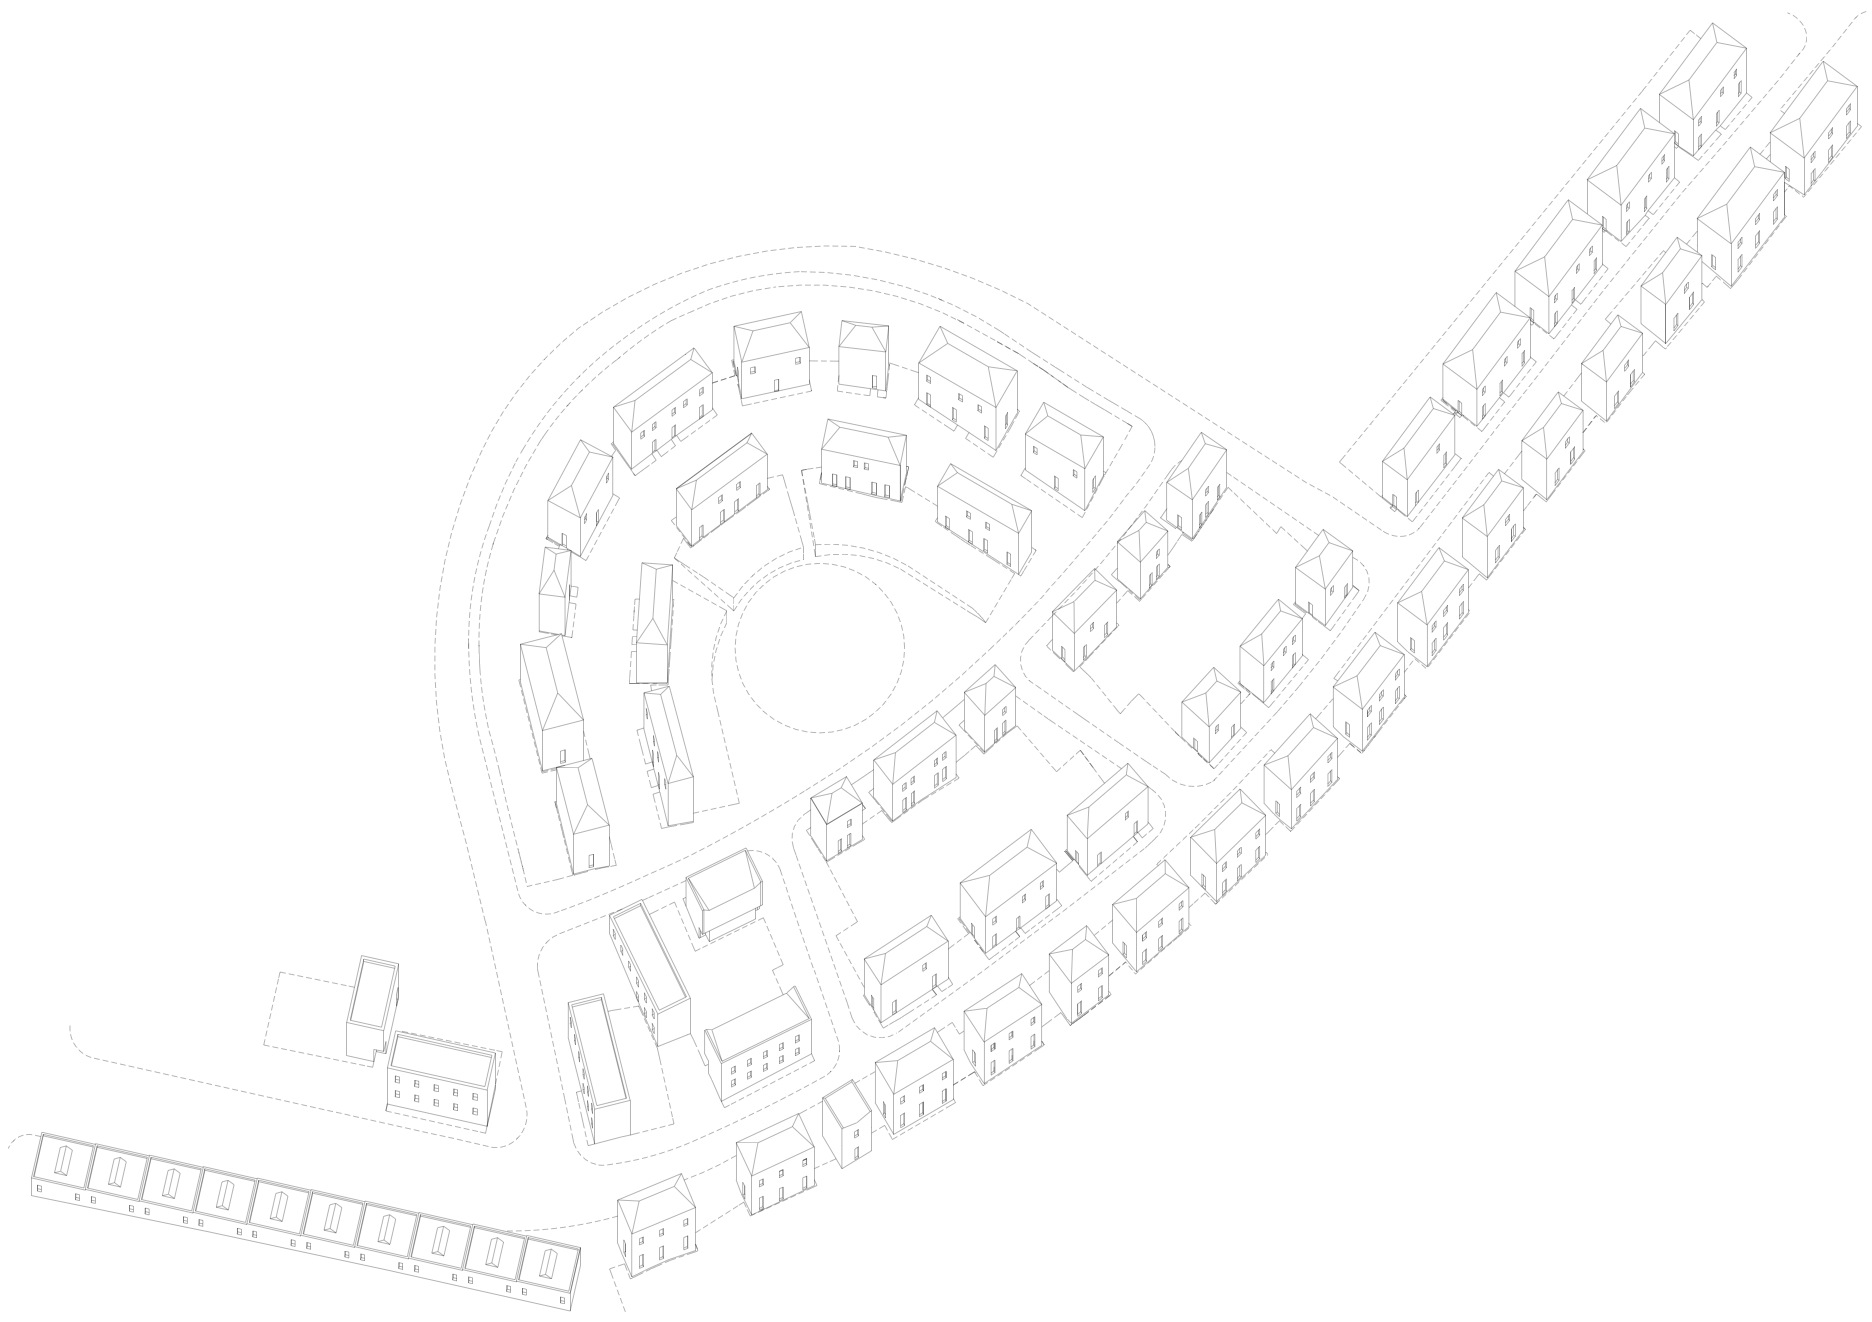 167_Axonometria geral